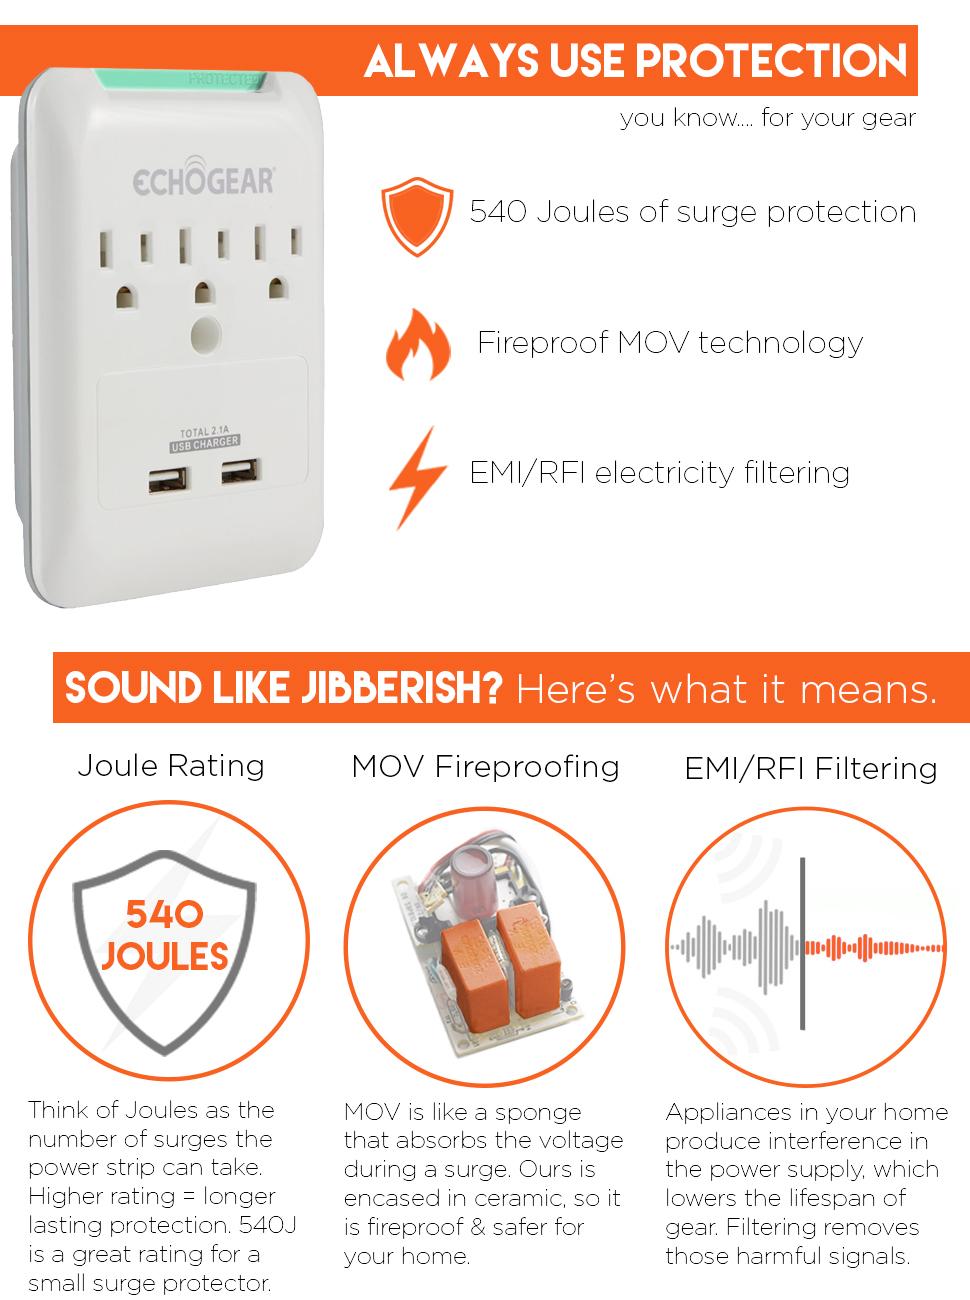 Amazon.com: ECHOGEAR Low Profile Surge Protector Design With 3 AC ...